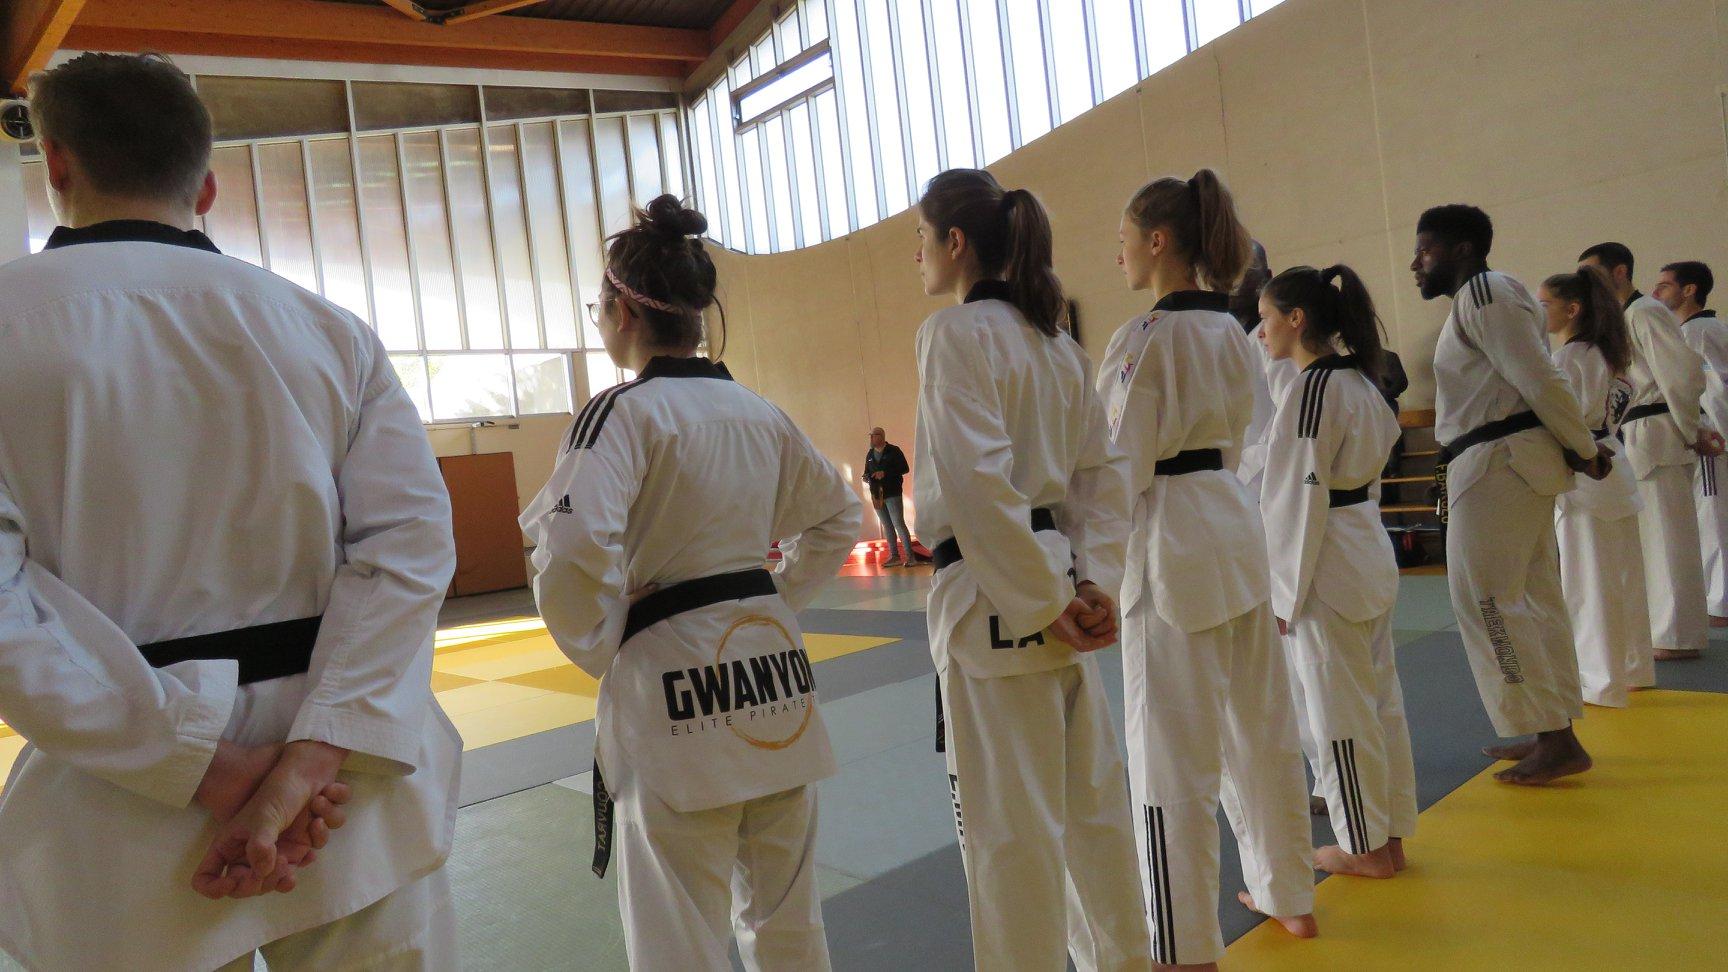 | Gwanyong Taekwondo